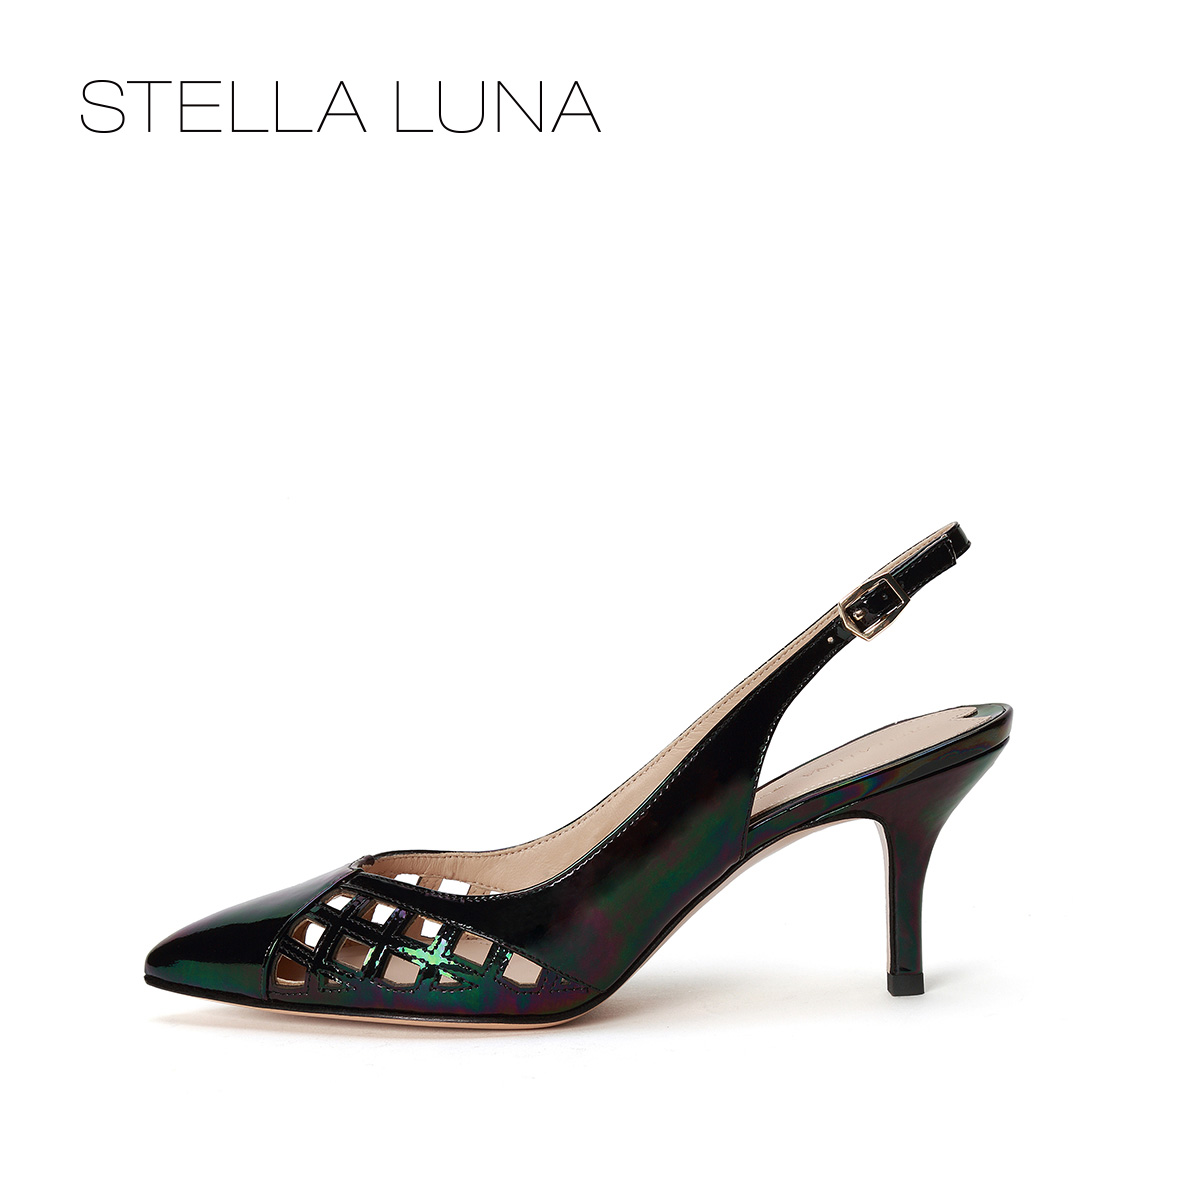 STELLA LUNA镂空小猫跟女鞋牛皮尖头一字扣凉鞋SG160L02406